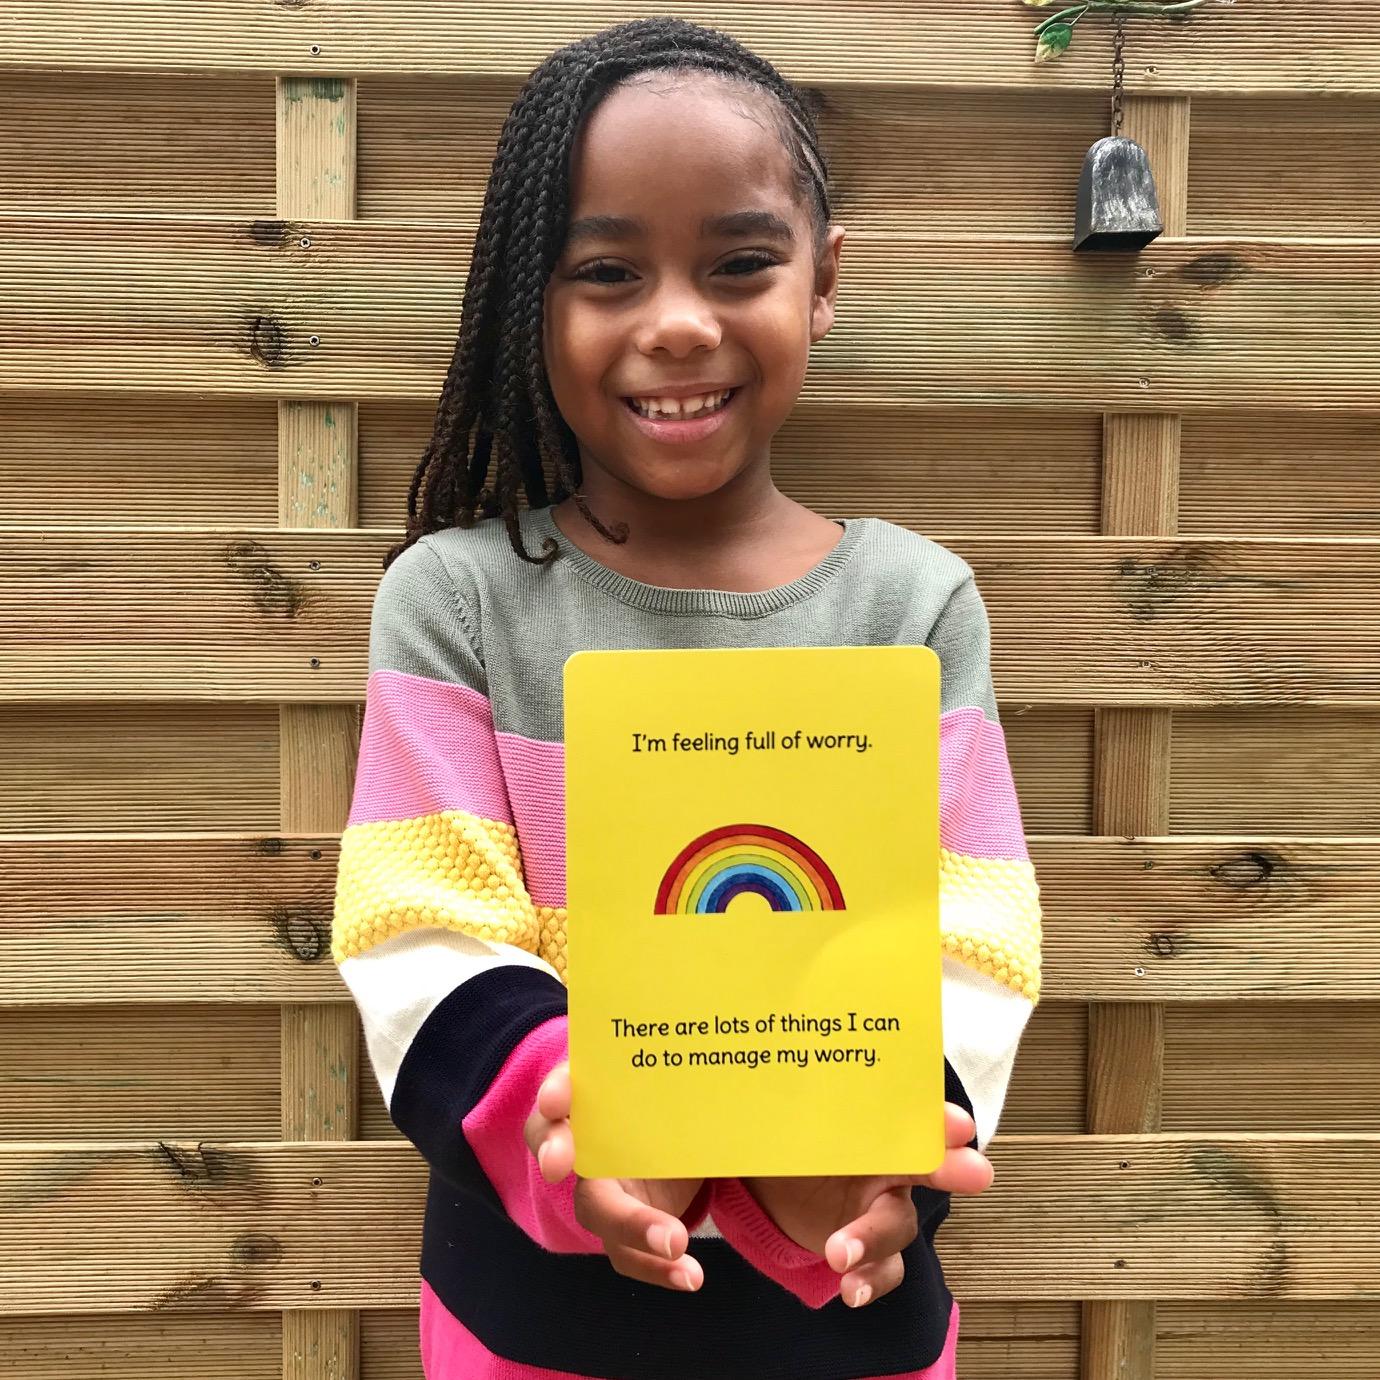 Managing worries. Growth mindset. Children's mental health